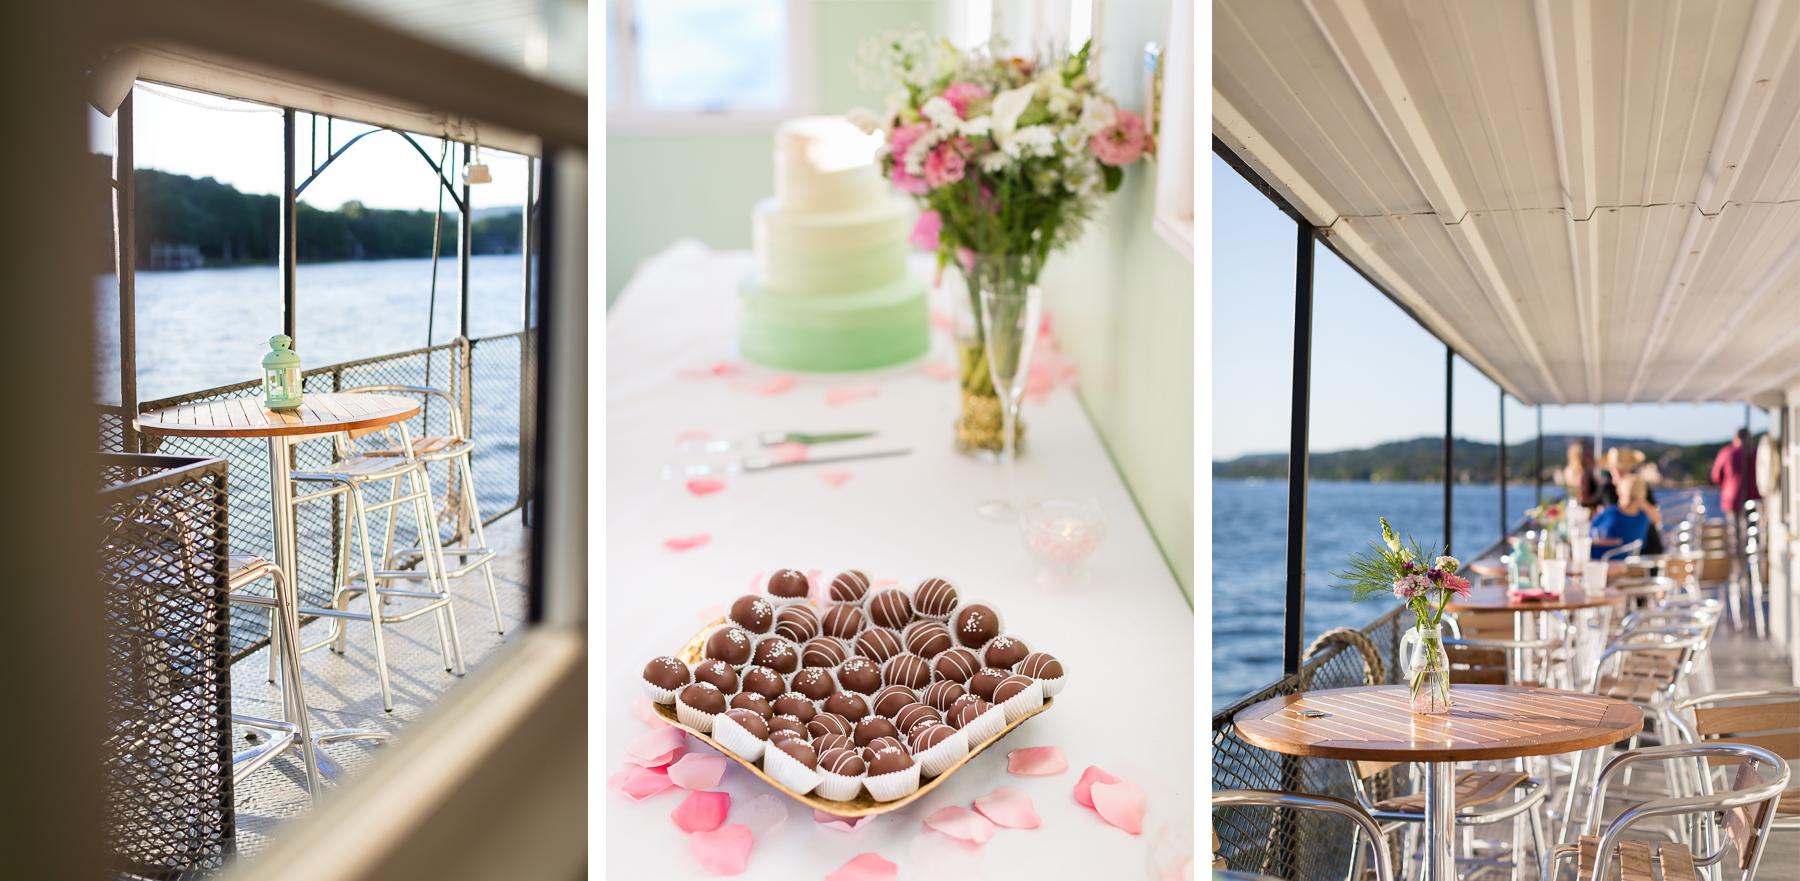 Lake-austin-boat-wedding-prickly-pair-farms.jpg